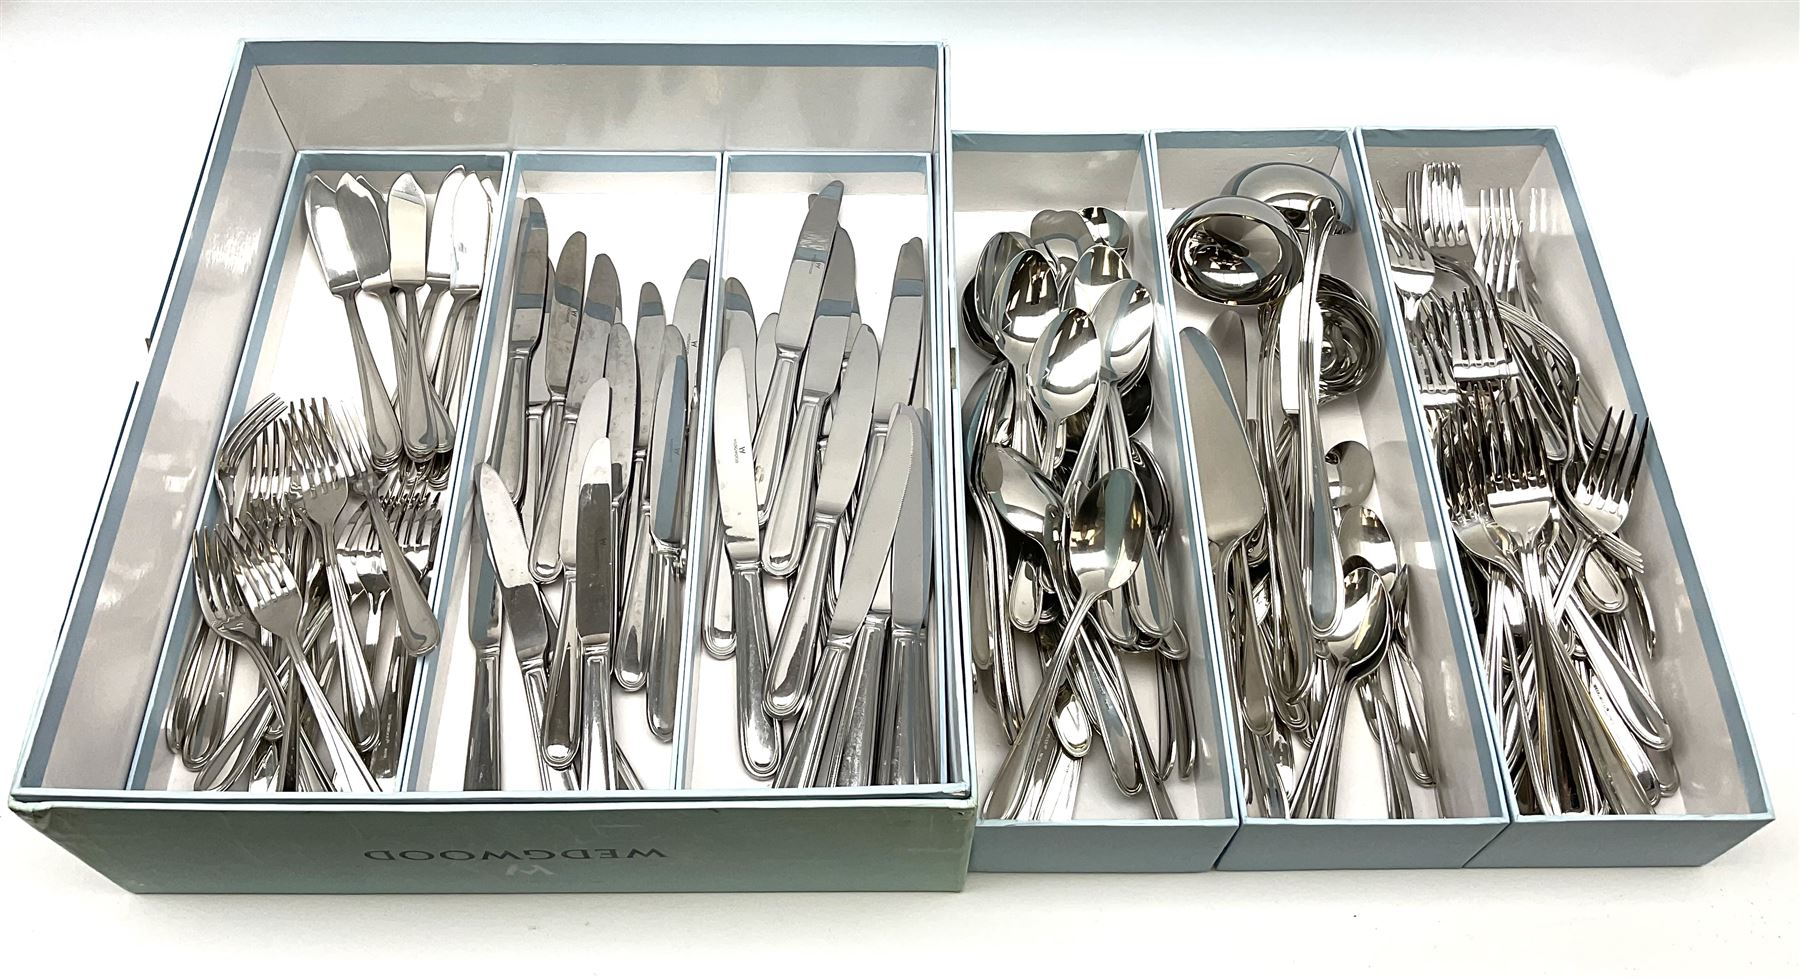 Wedgwood cutlery service